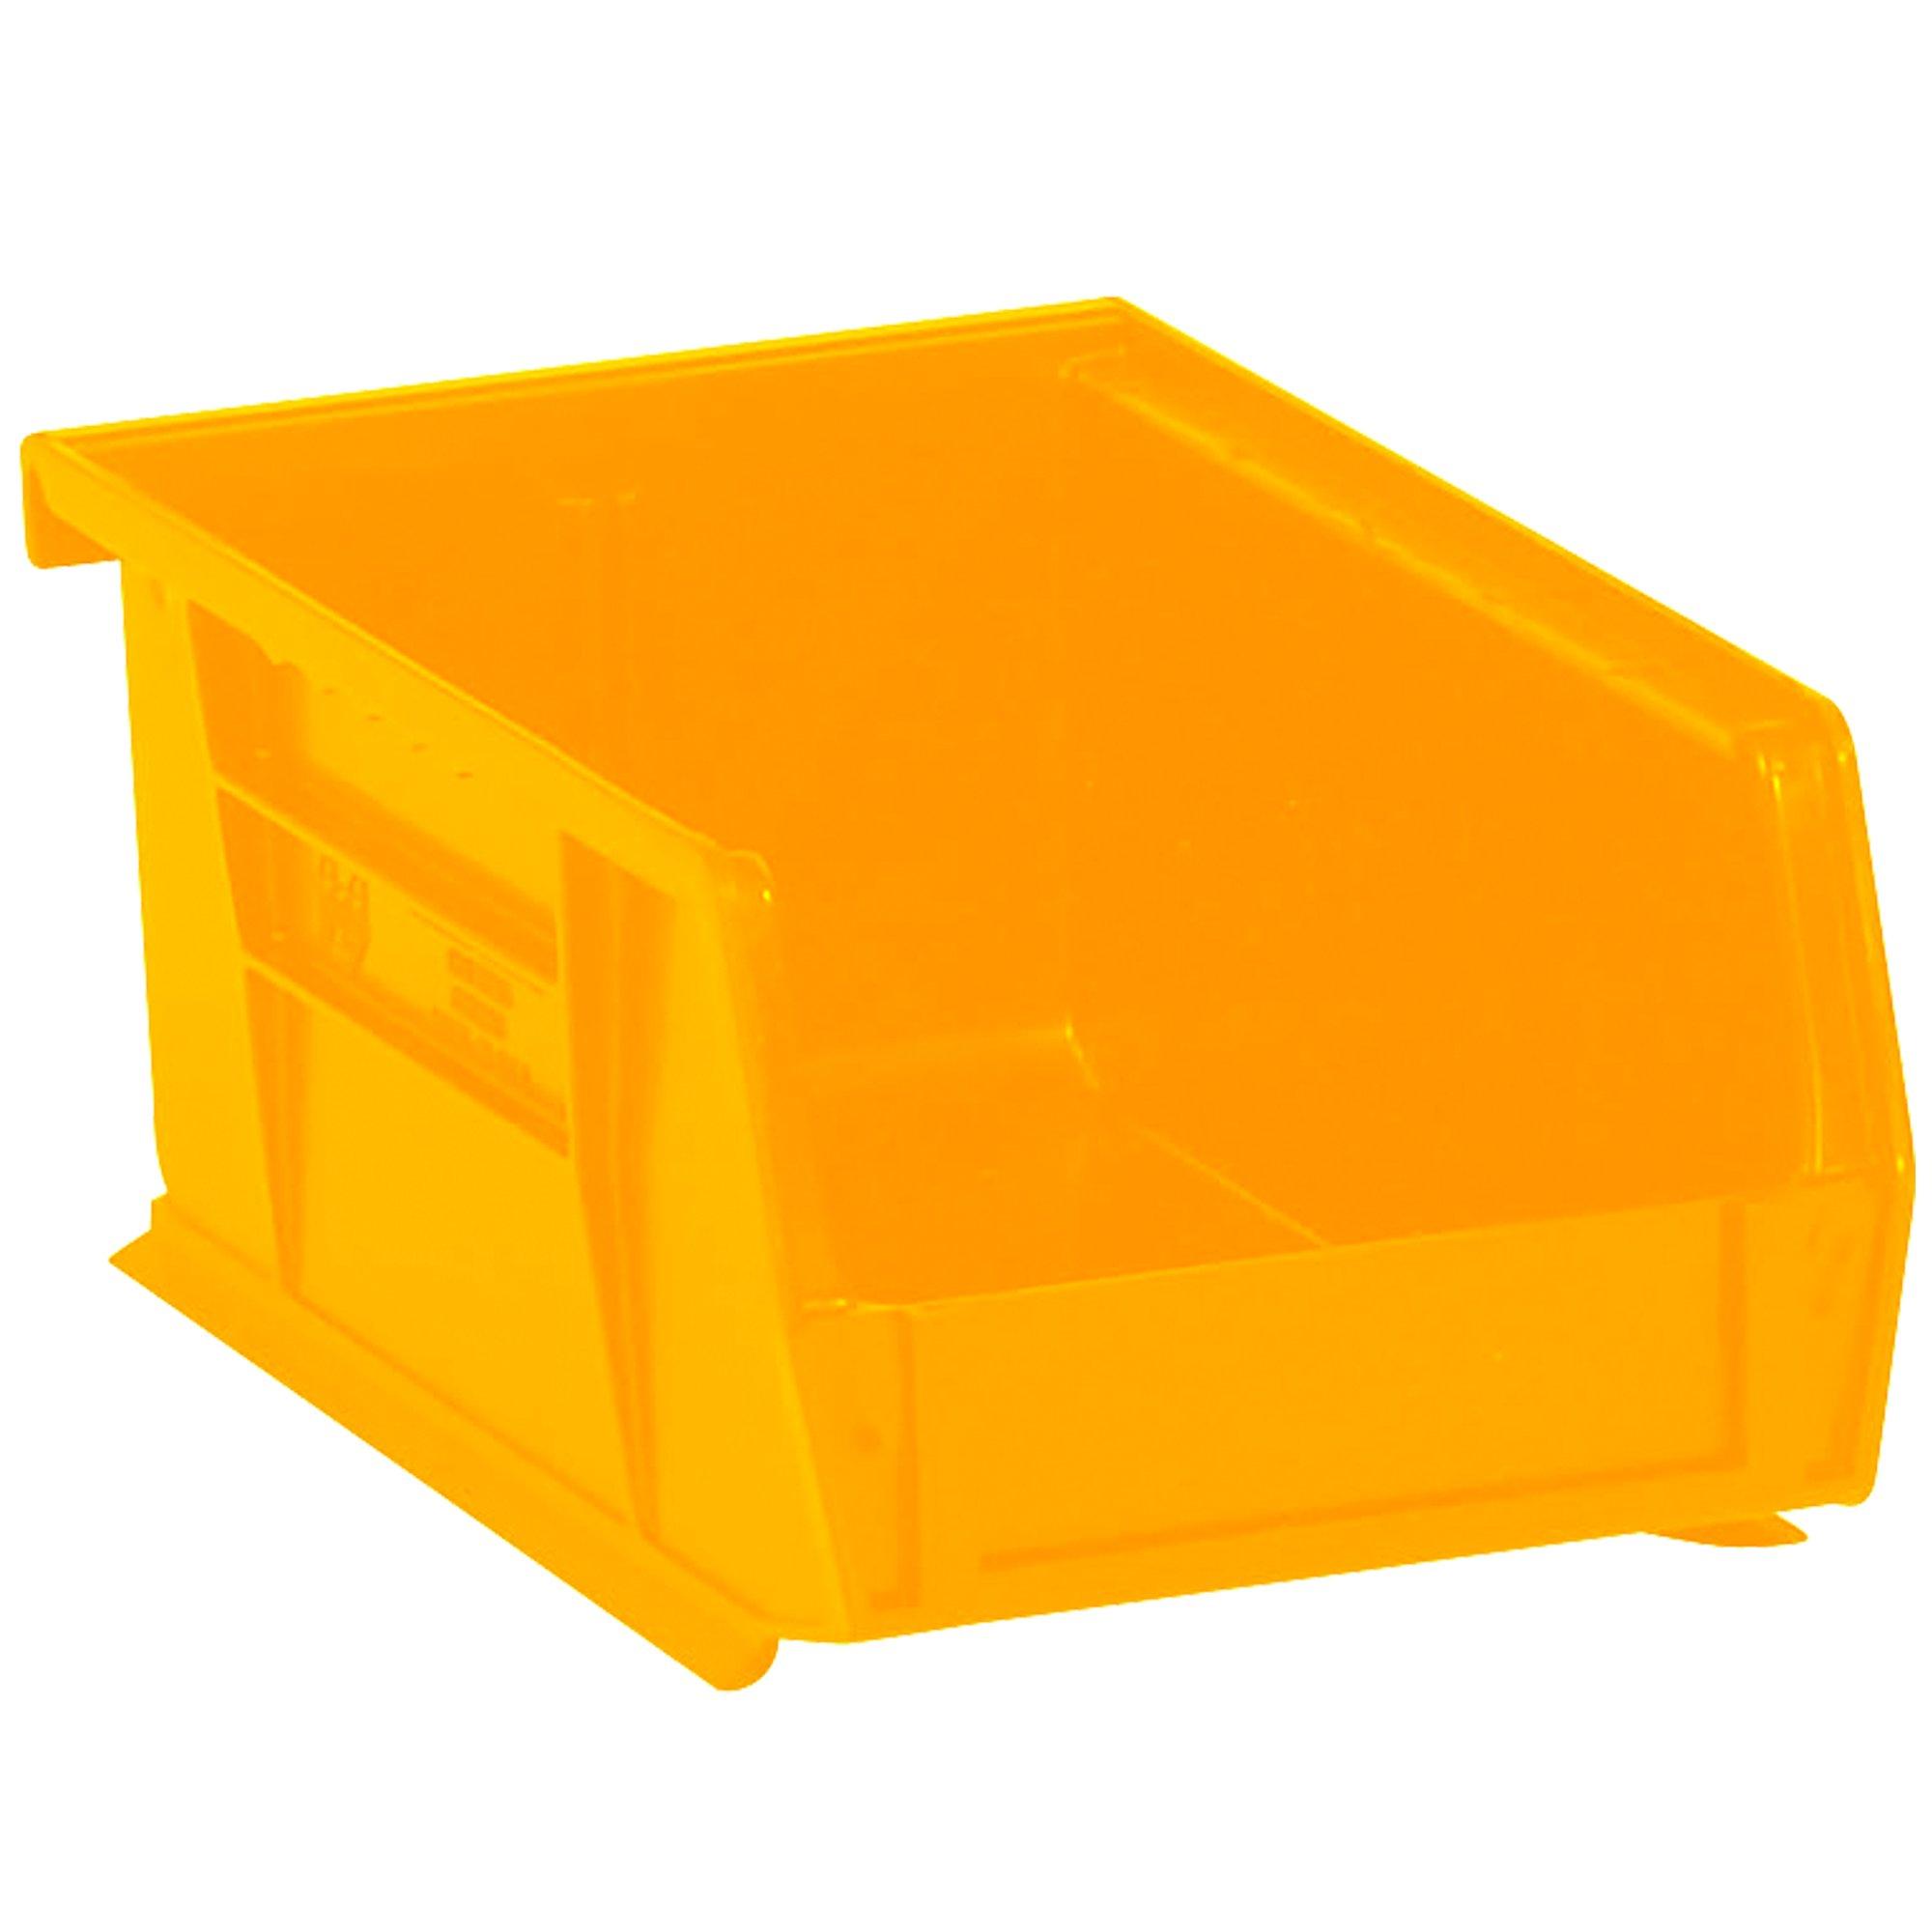 Aviditi BINP0965Y Plastic Stack and Hang Bin Boxes, 9 1/4'' x 6'' x 5'', Yellow (Pack of 12)